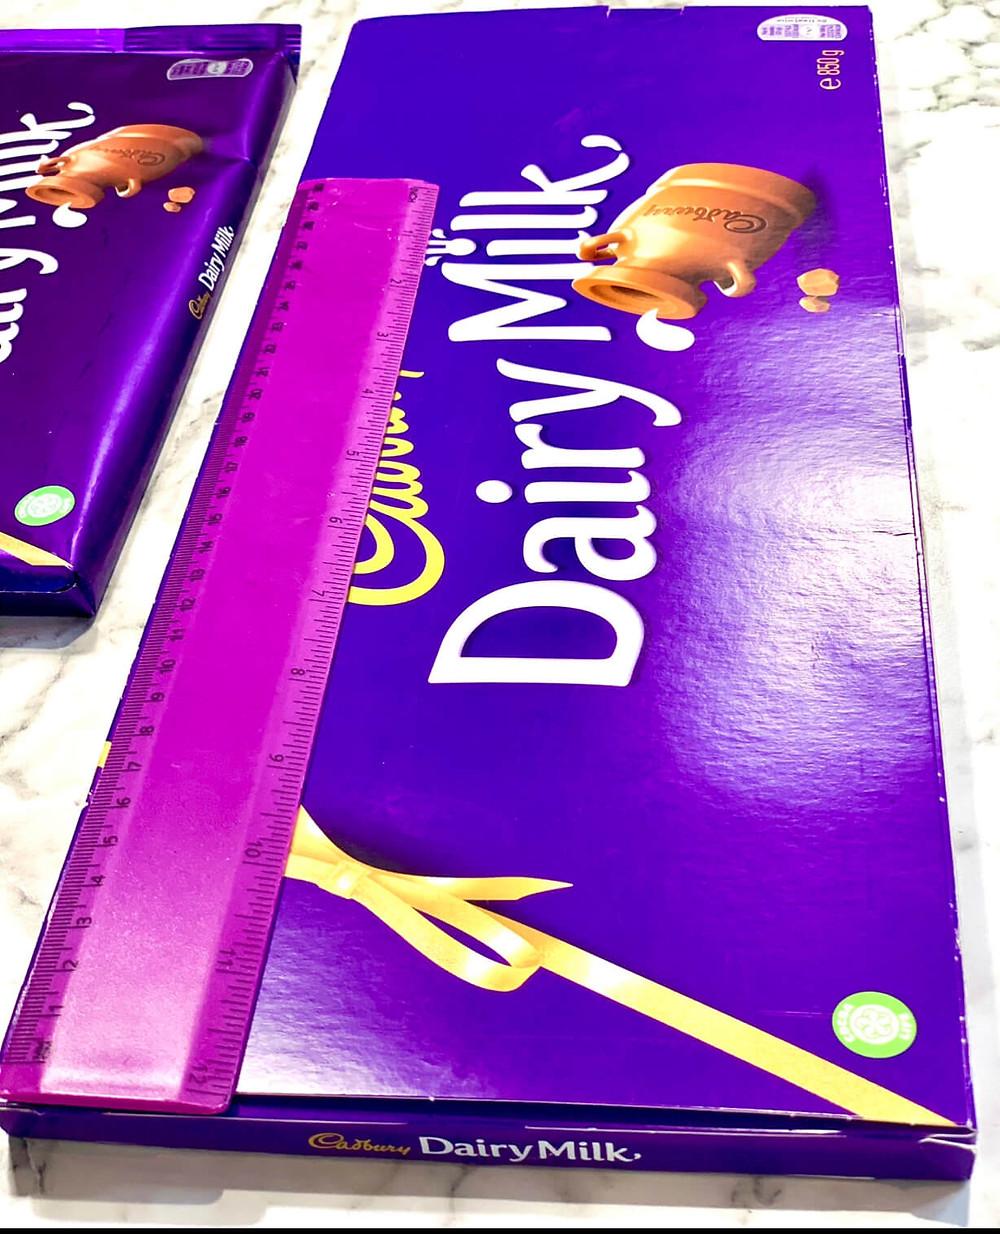 850g Cadbury Chocolate Bar